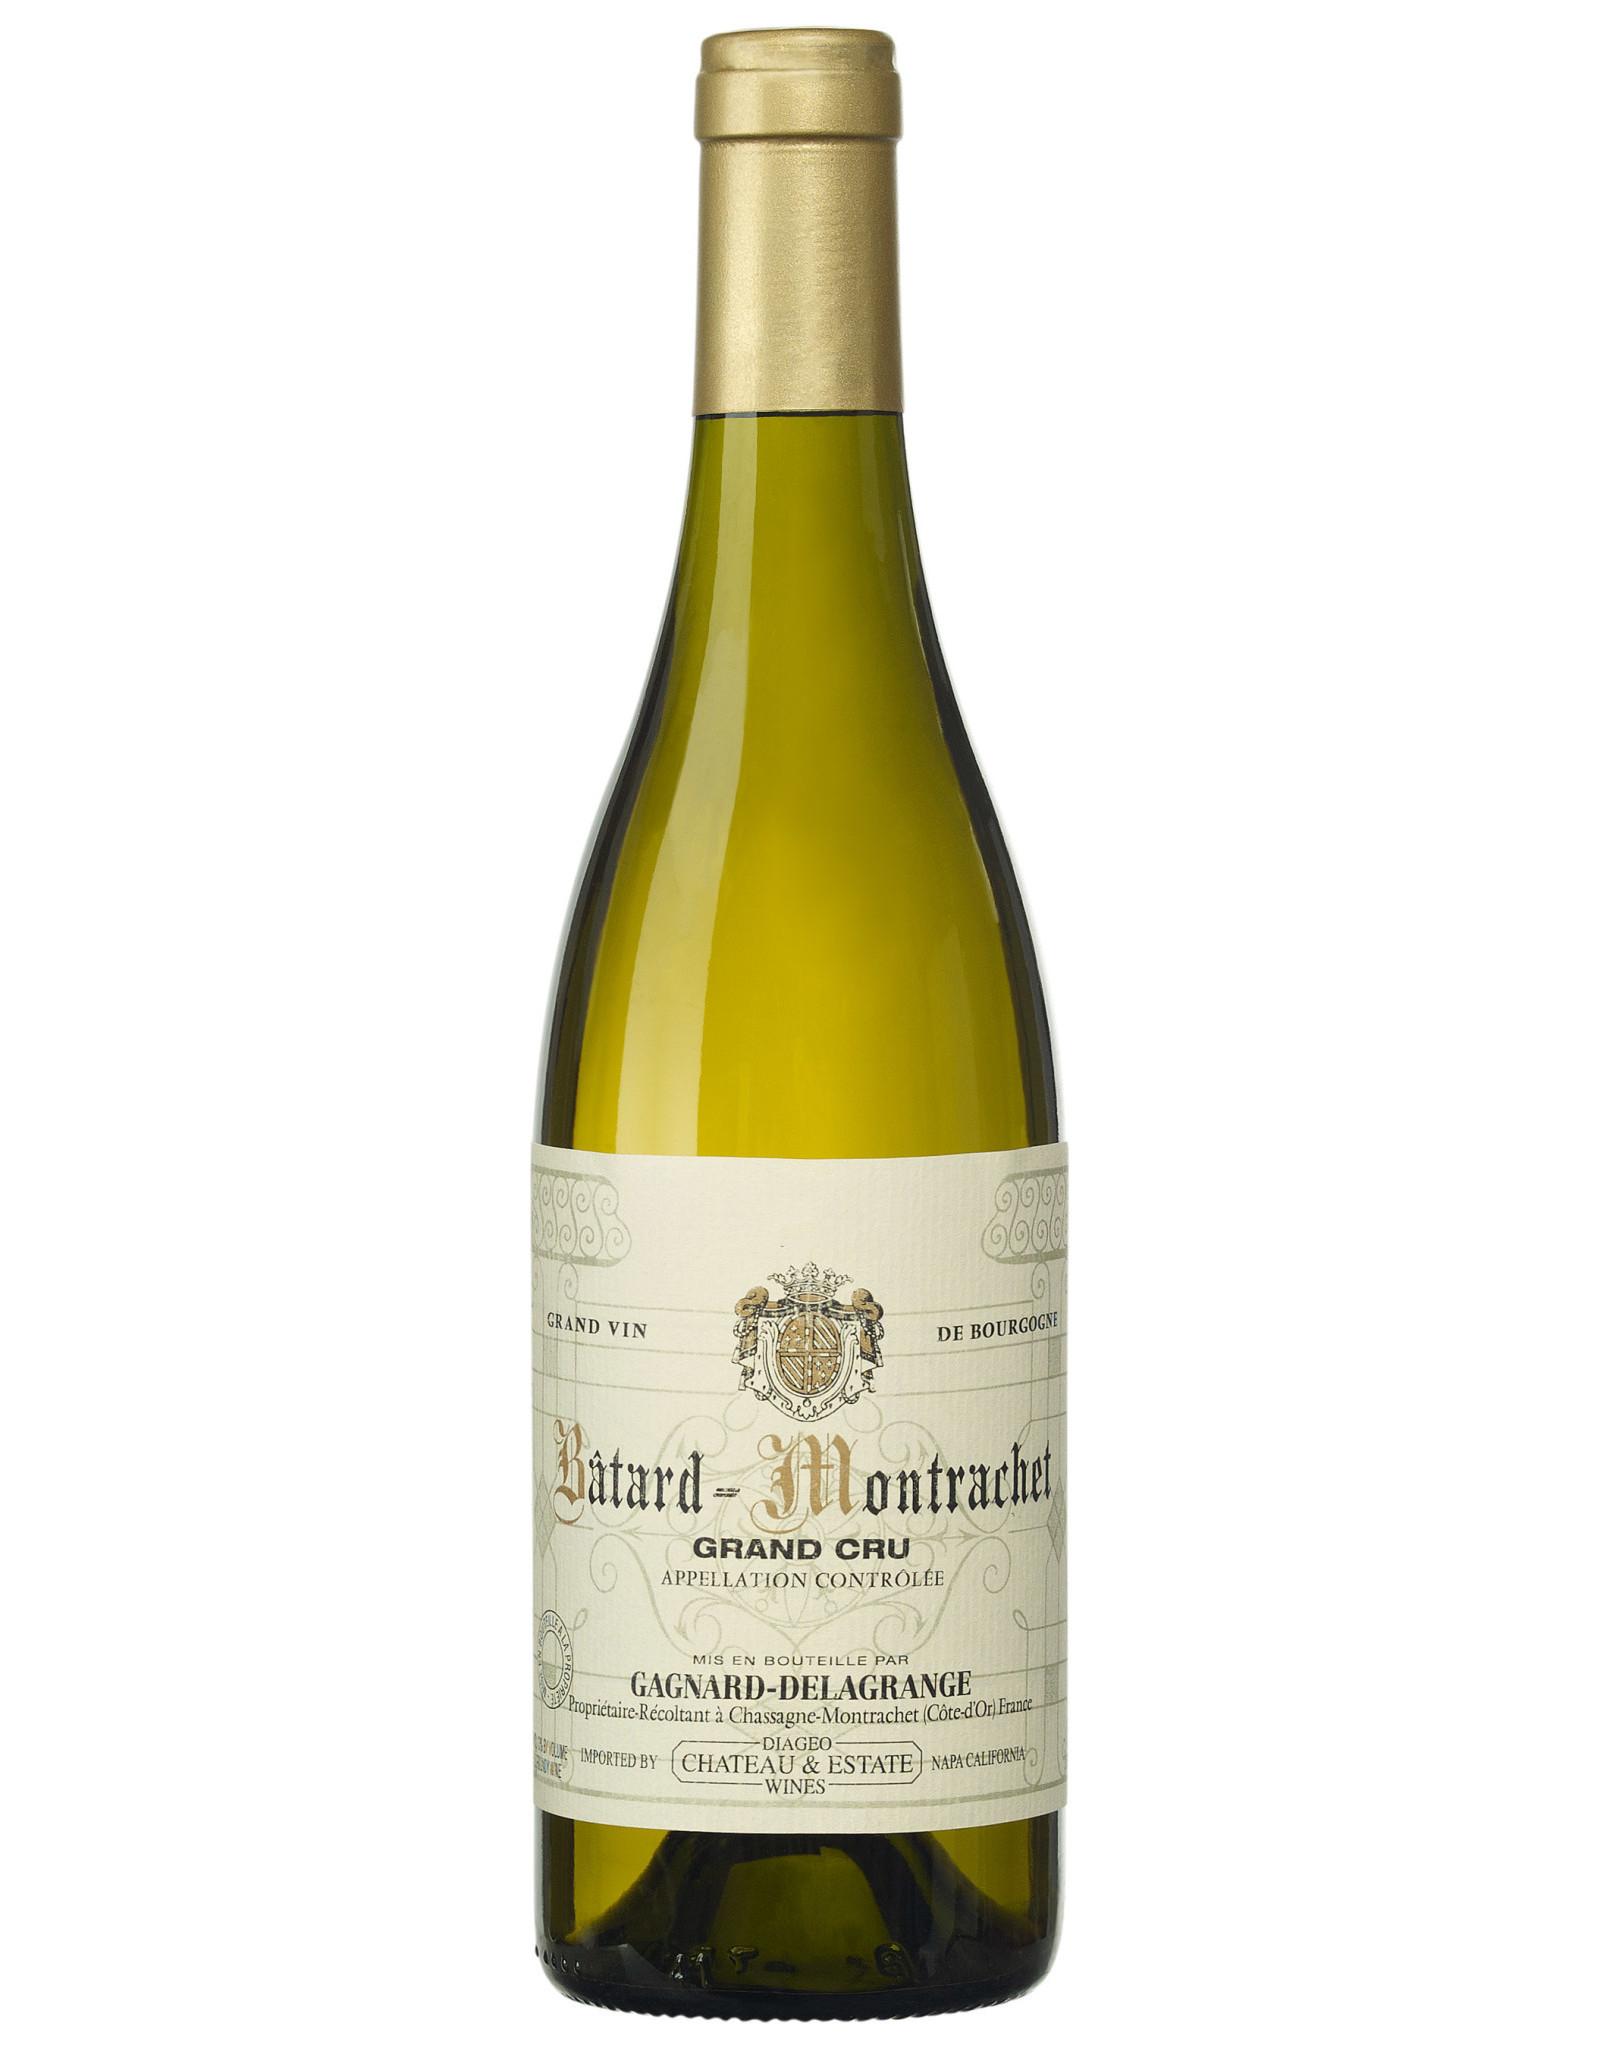 Domaine Gagnard-Delagrange, Batard-Montrachet Grand Cru 2017